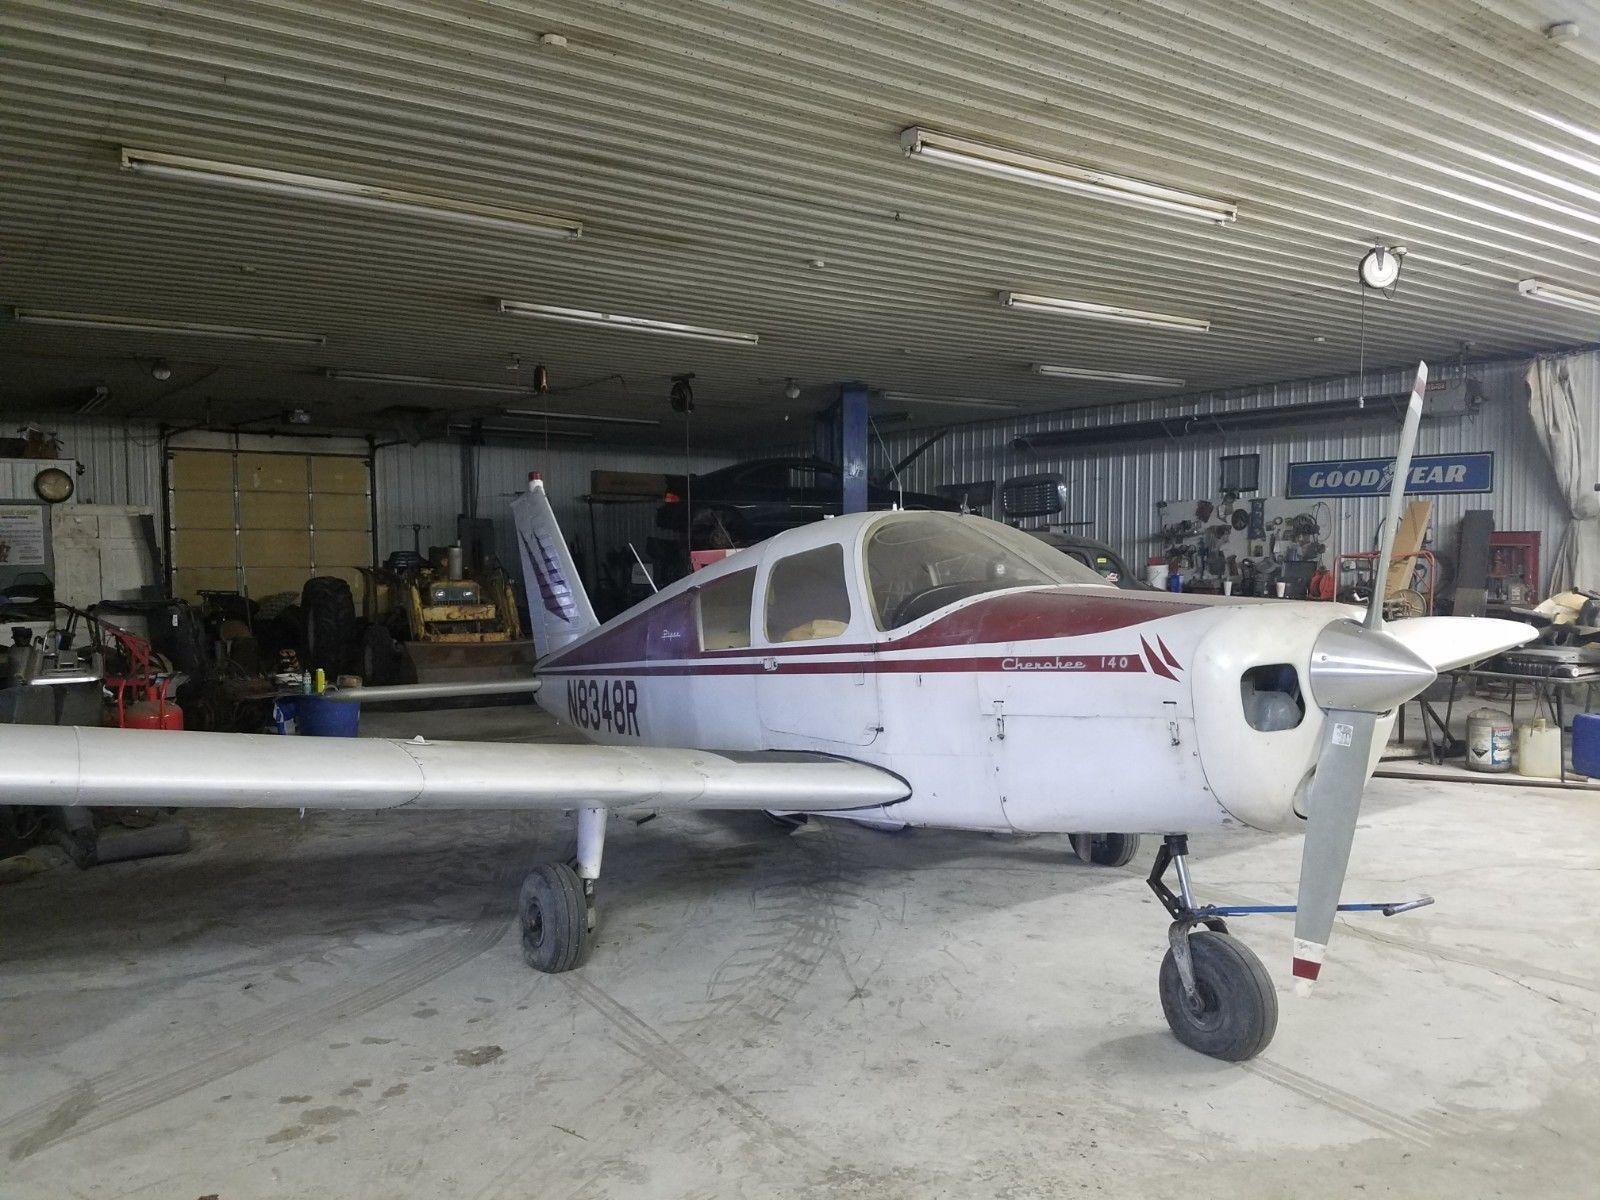 needs paint 1966 Piper Cherokee 140 aircraft